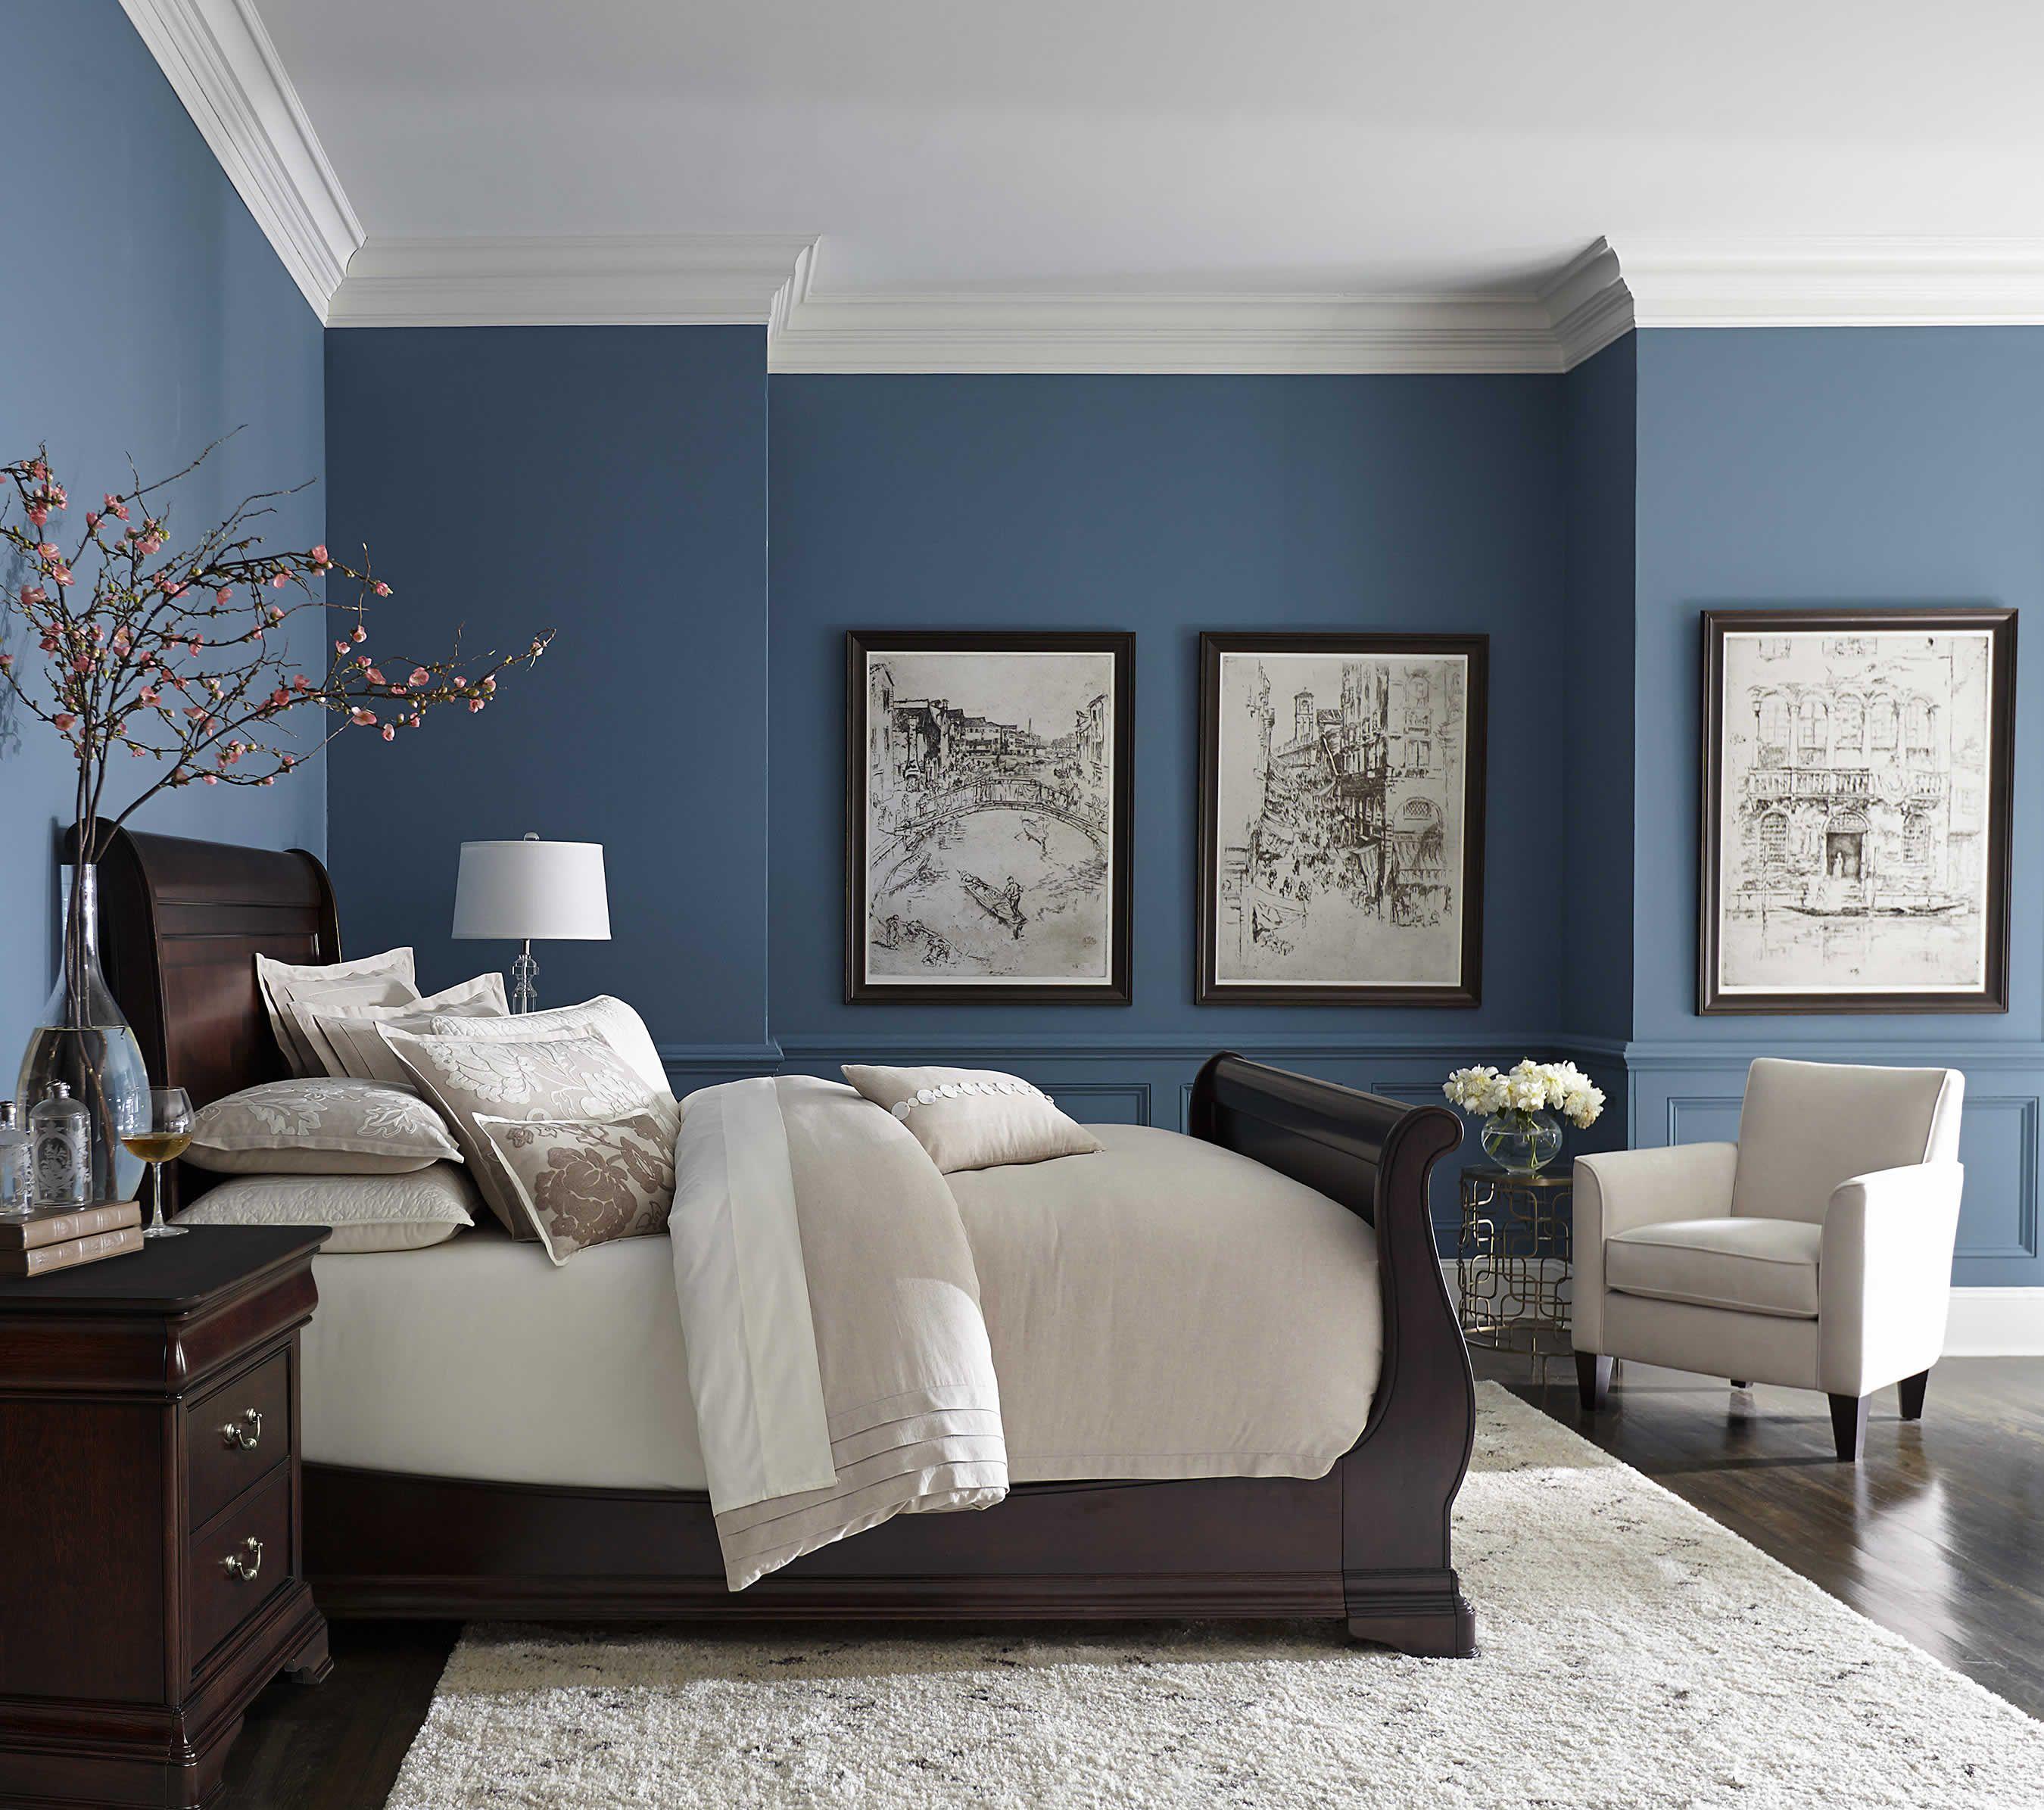 Effortlessly Elegant Small Master Bedroom Remodel Bedroom Master Bedroom Colors